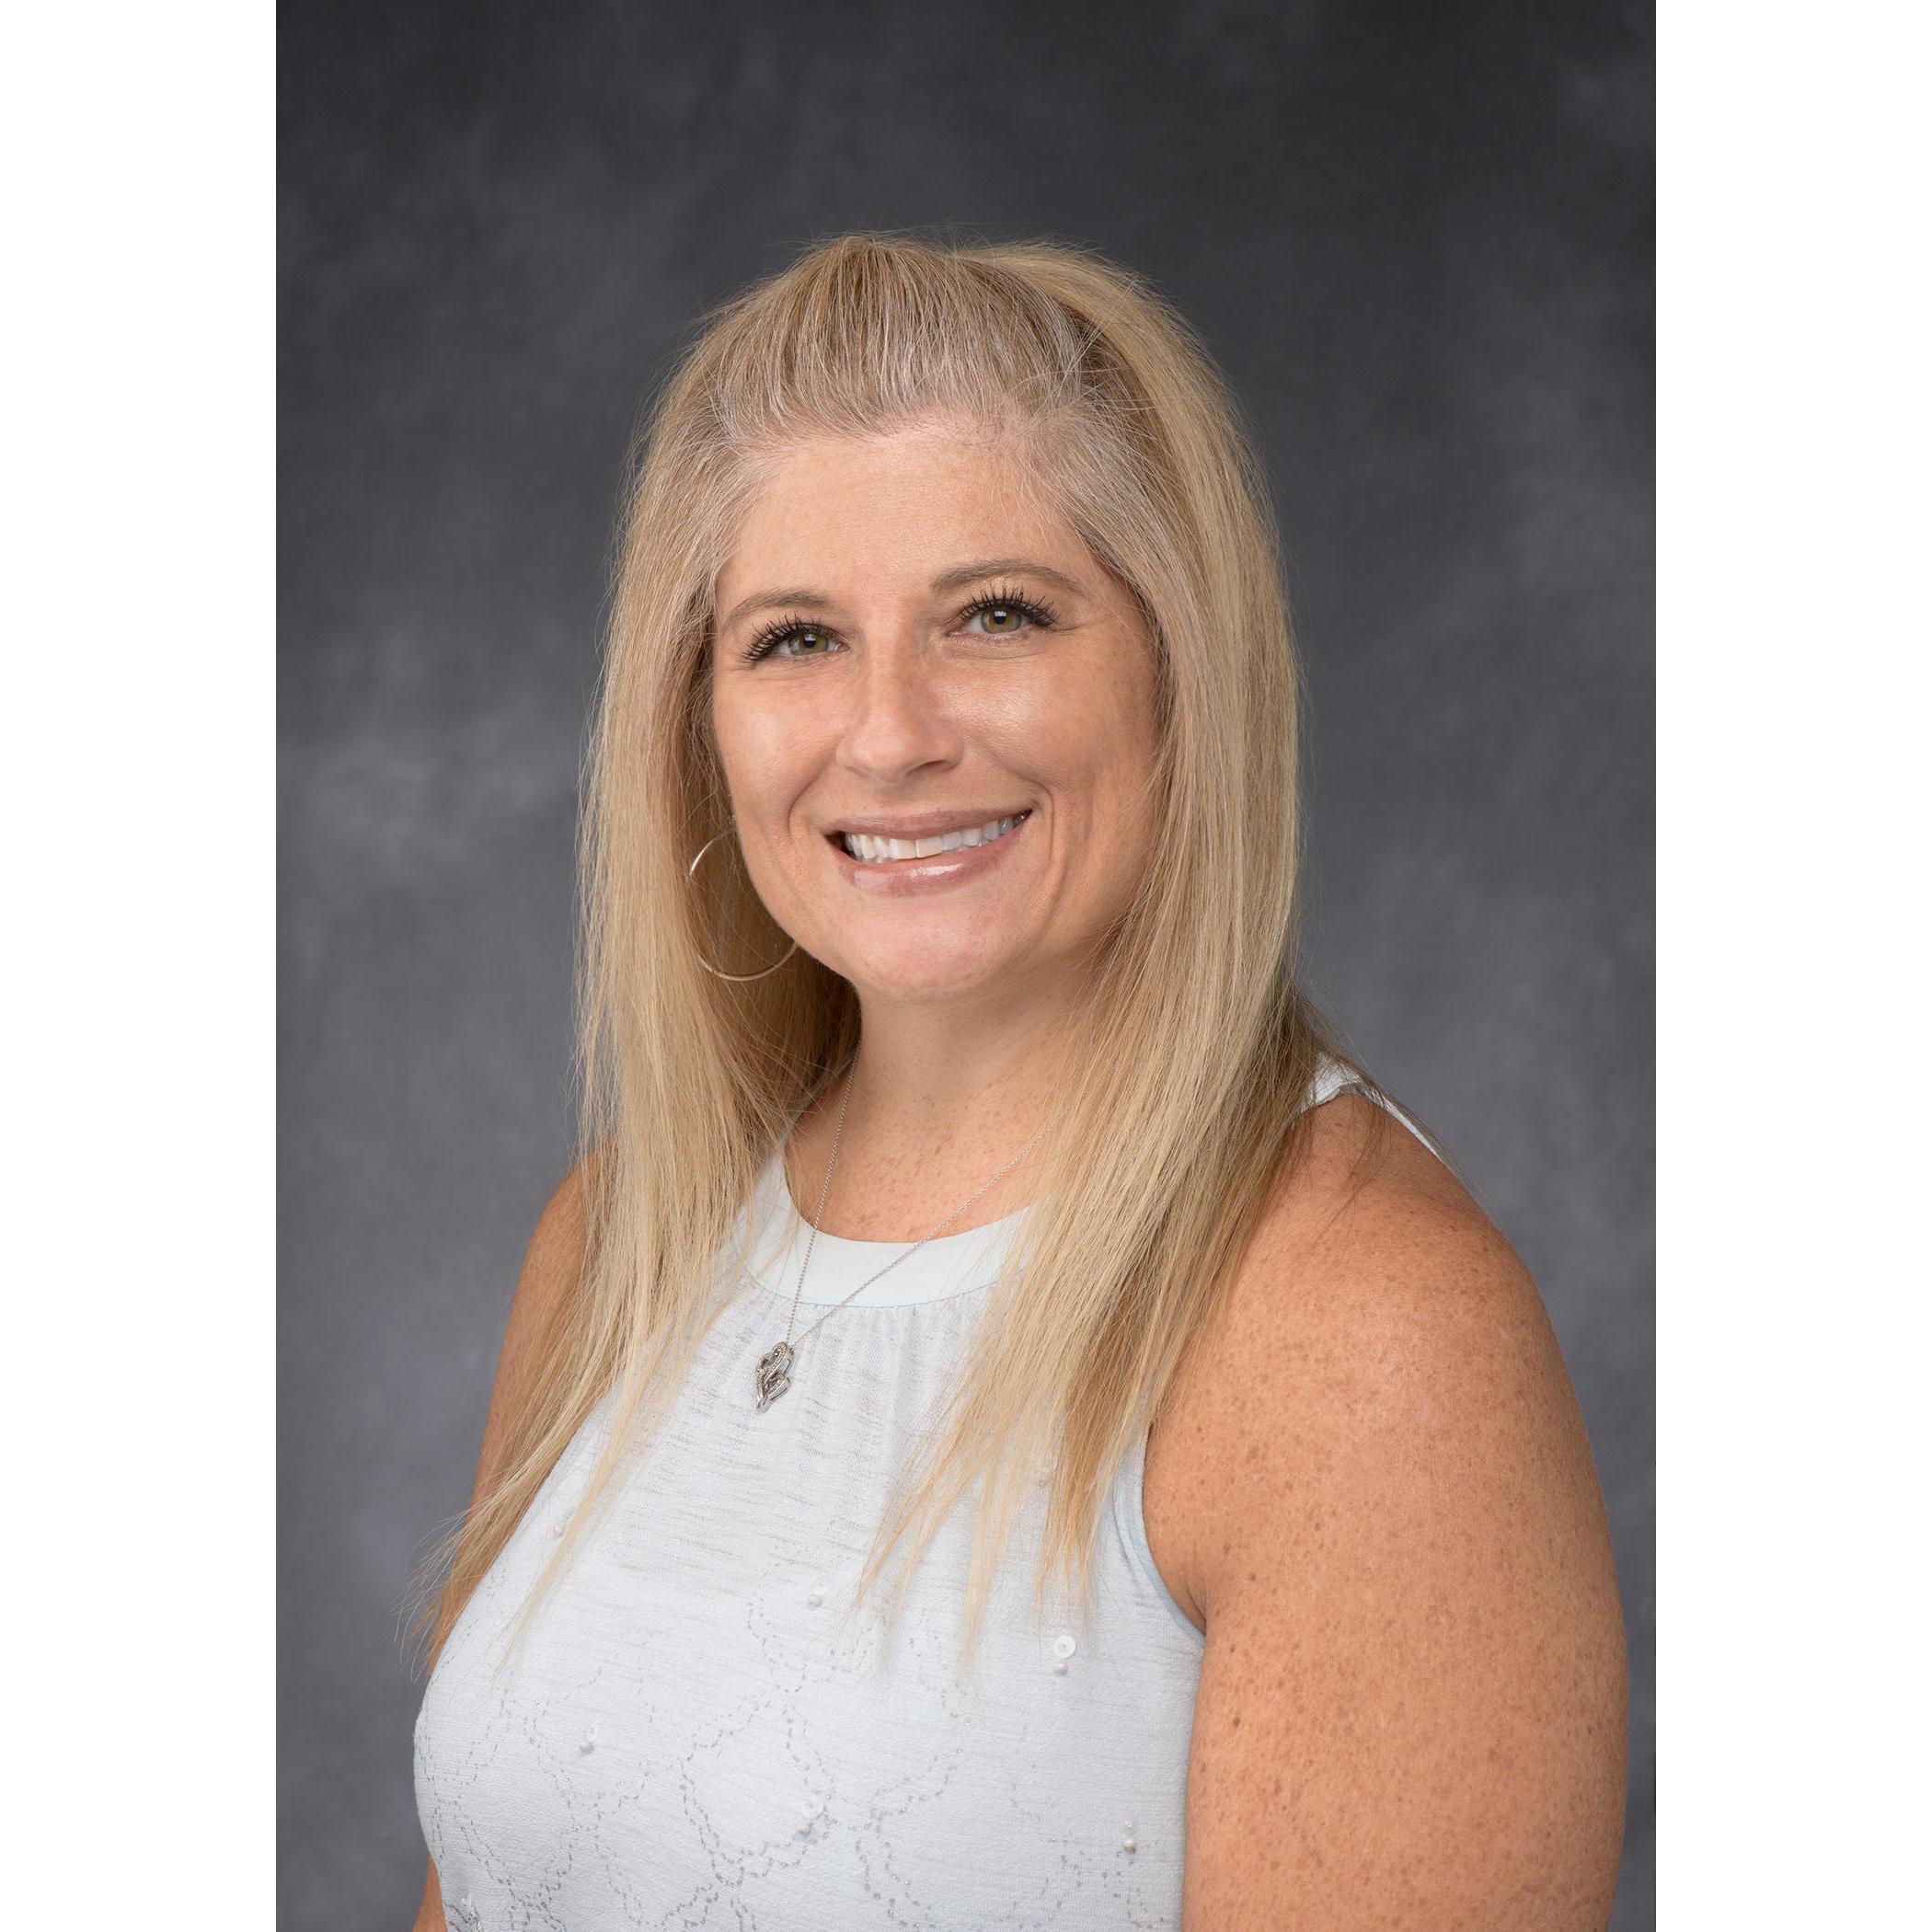 Melissa Sheridan - Phoenix, AZ - General or Family Practice Physicians